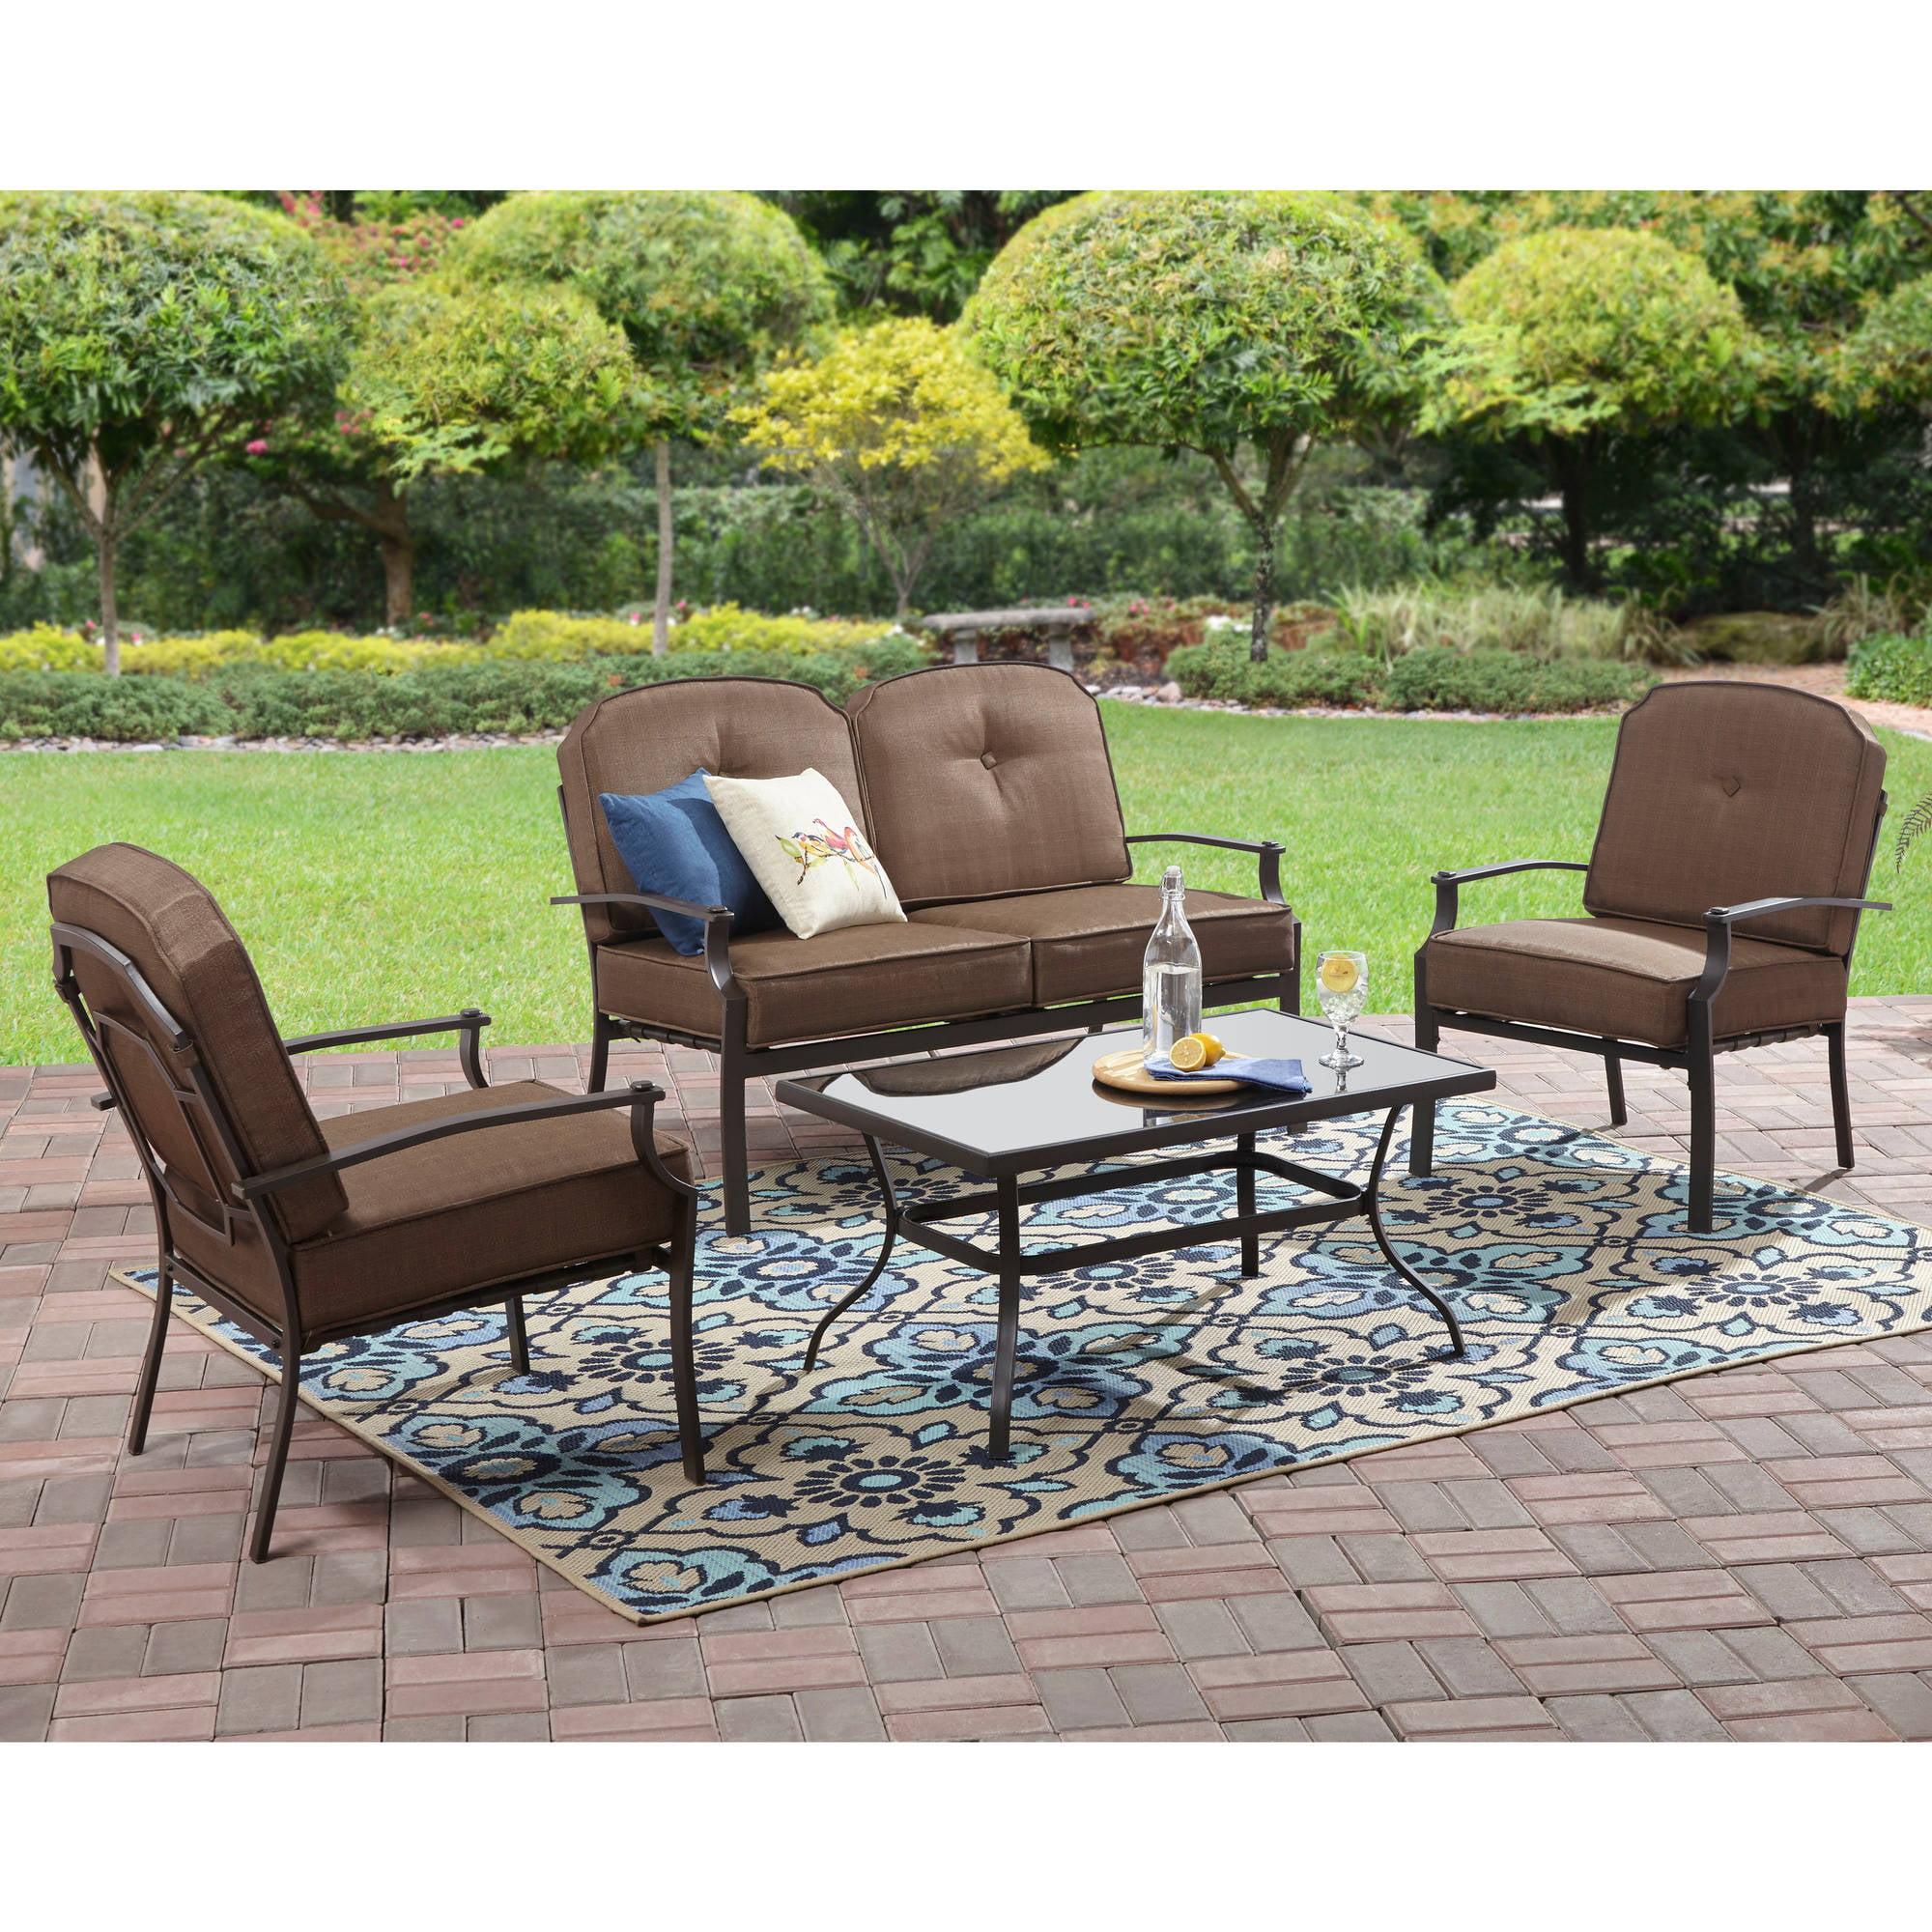 Mainstays Wentworth 4-Piece Patio Conversation Set, Seats 4